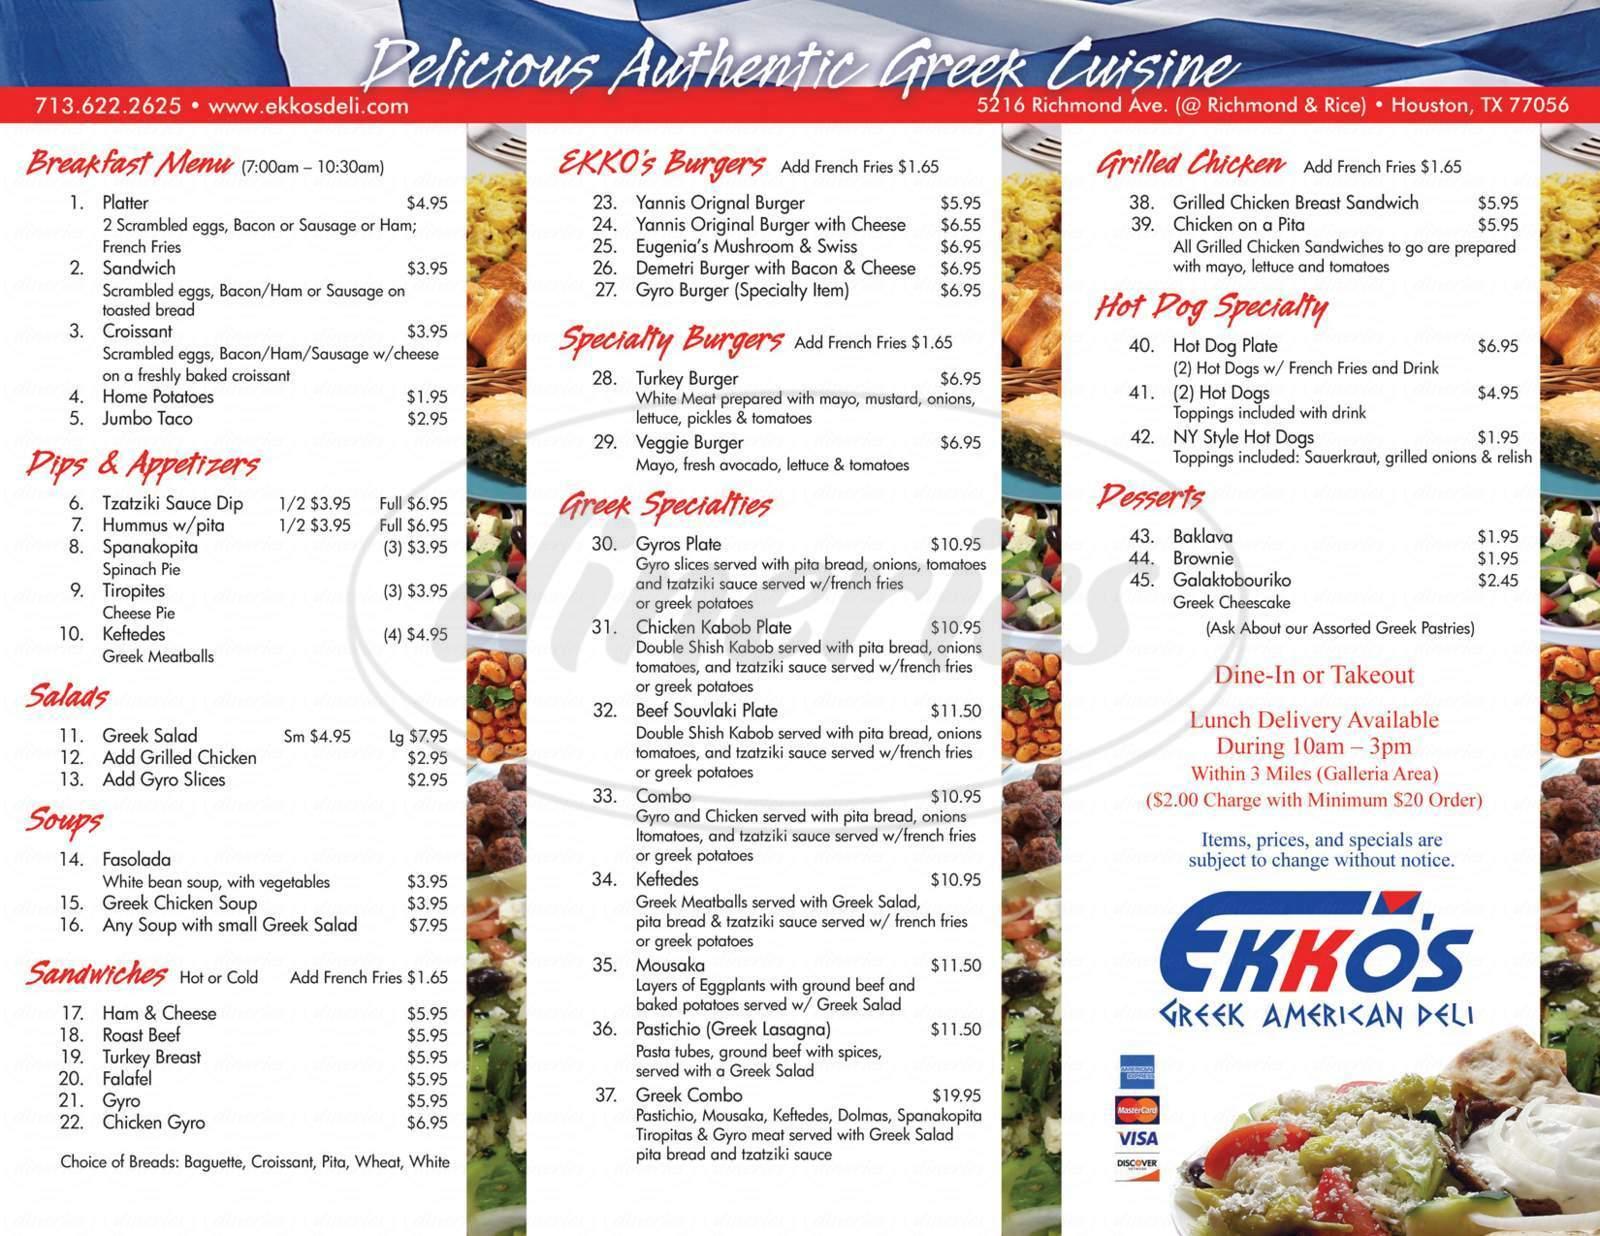 menu for Ekko's Greek American Deli